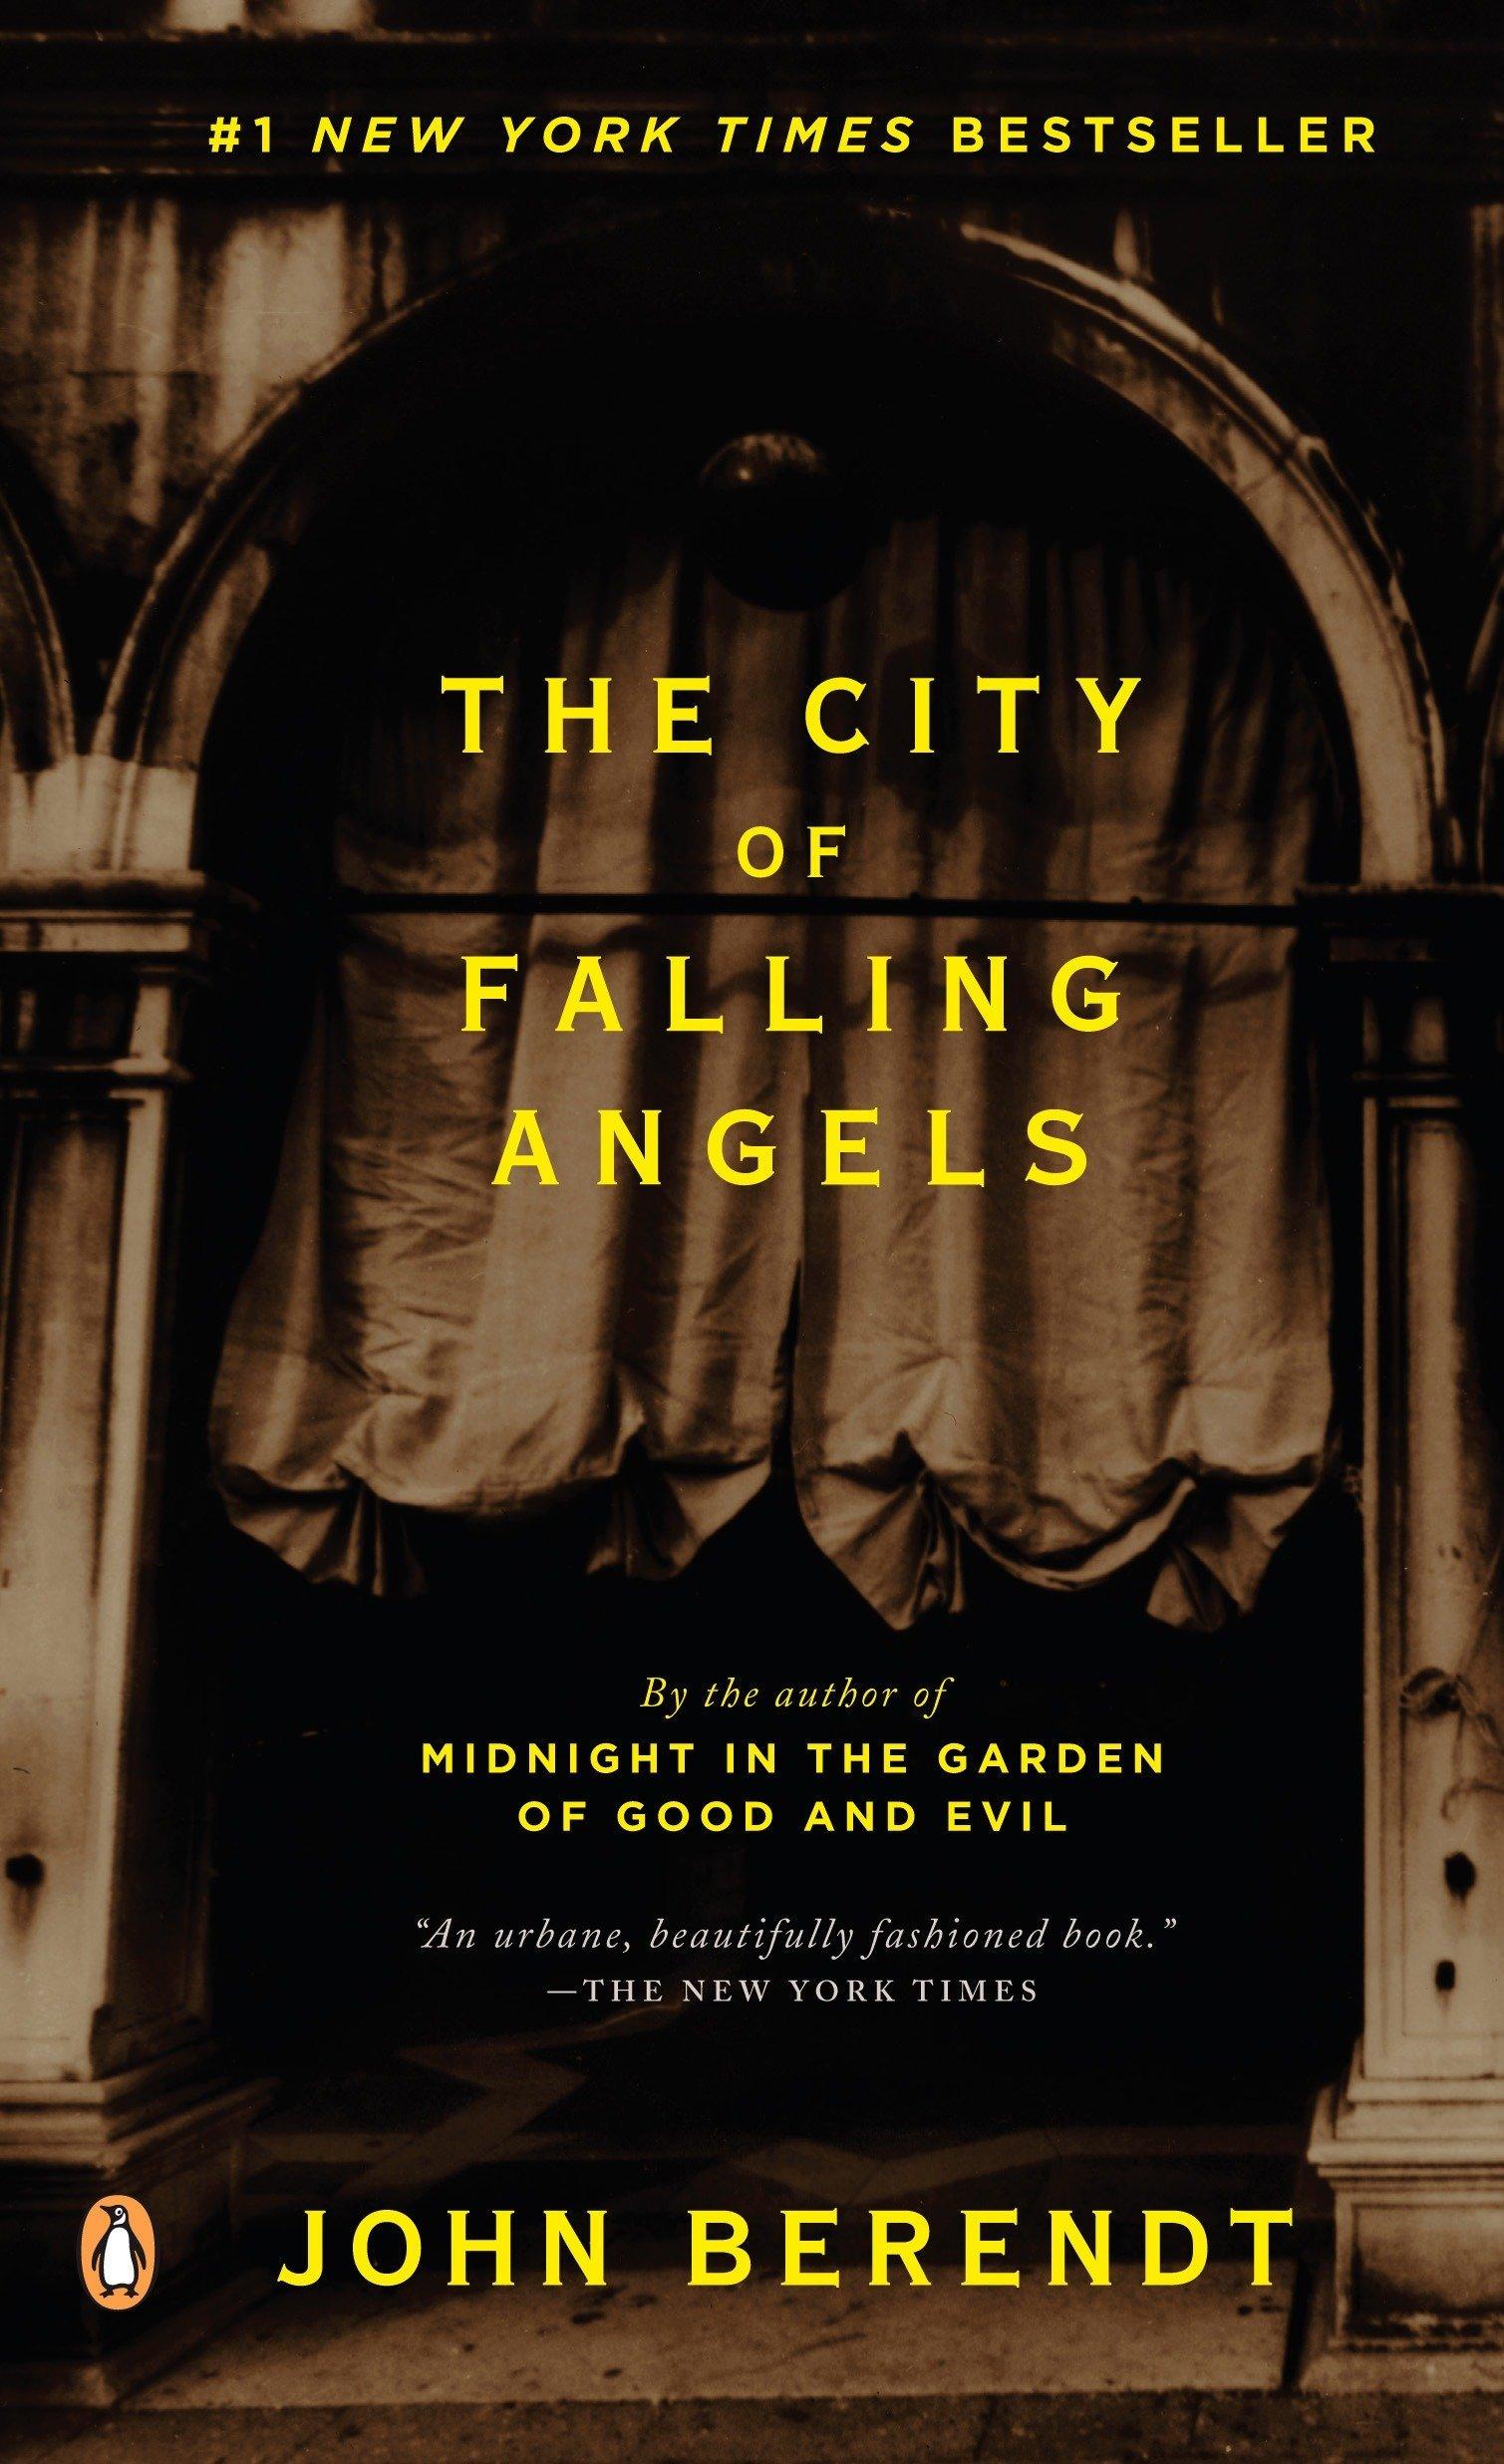 Amazon.com: The City of Falling Angels (9780143036937): John Berendt ...